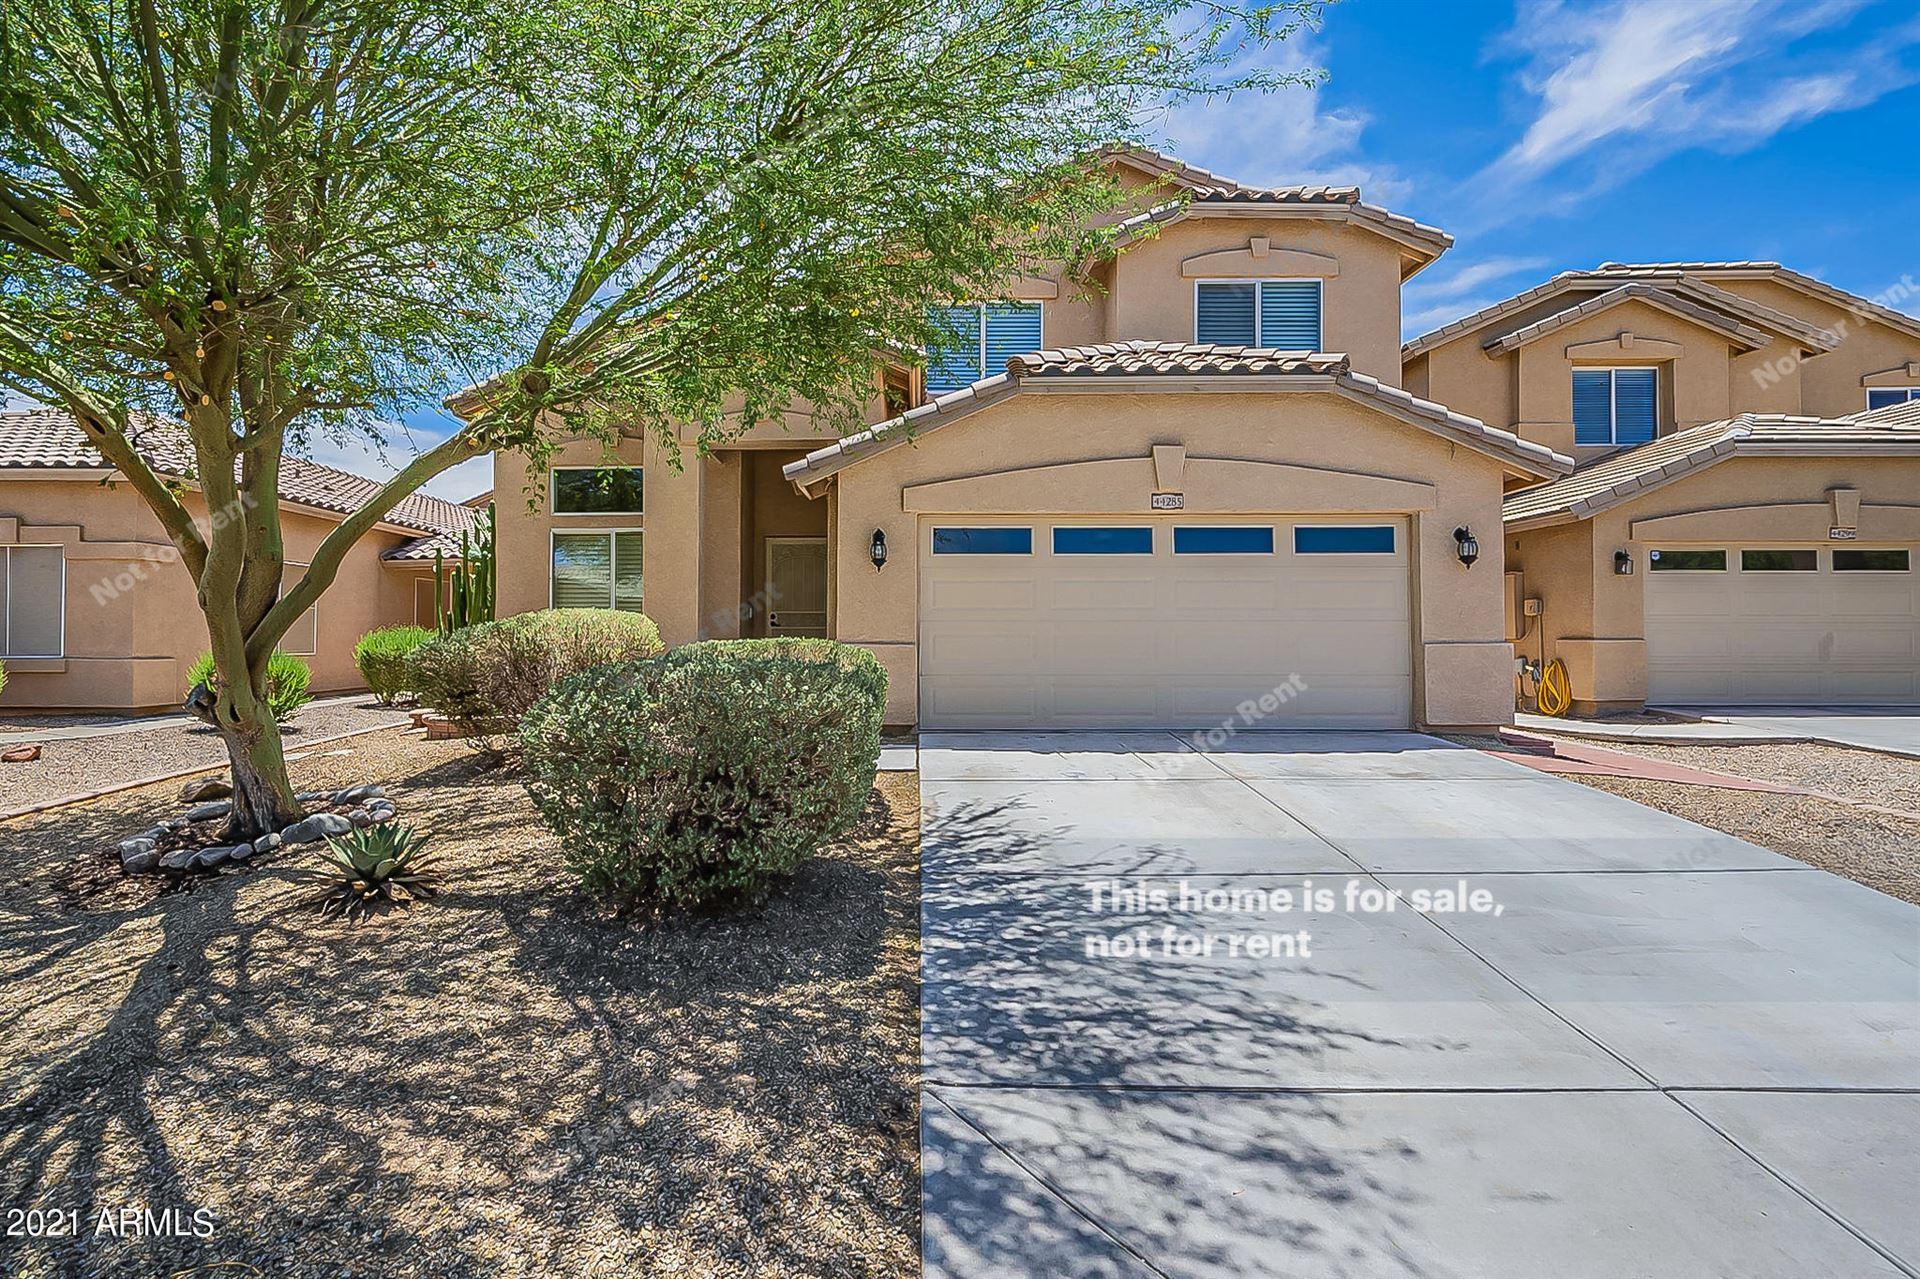 Photo for 44285 W OSTER Drive, Maricopa, AZ 85138 (MLS # 6250193)